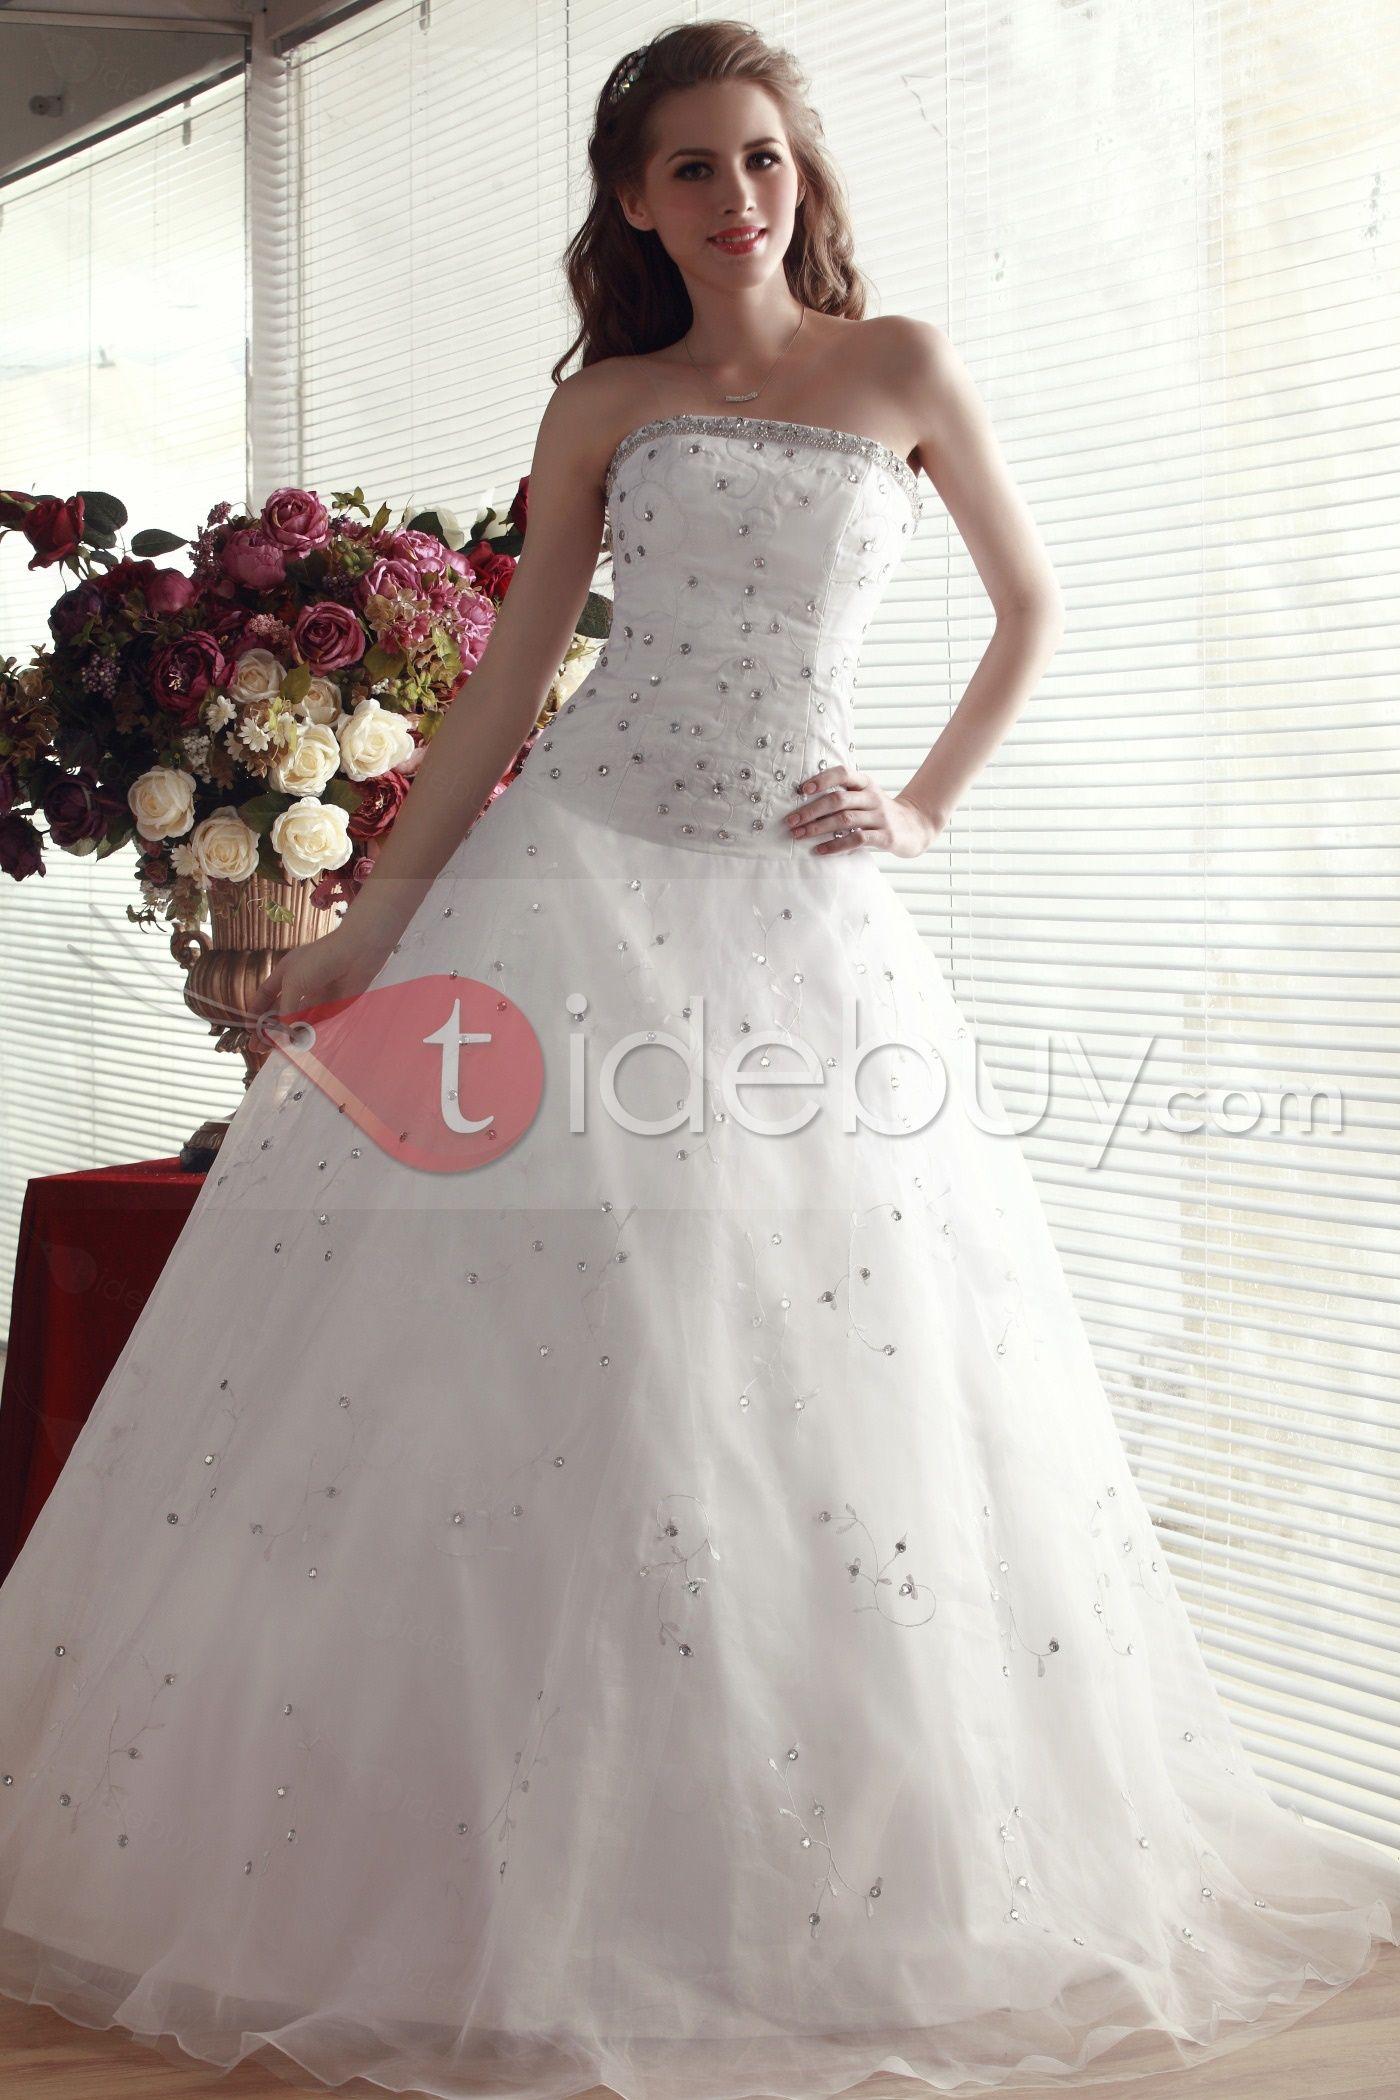 Silueta Ball Gown Largo al Piso sin Tirantes Beaded Vestido de Quinceañera Nadya's Quinseañera dresses ♥LB♥ http://es.tidebuy.com